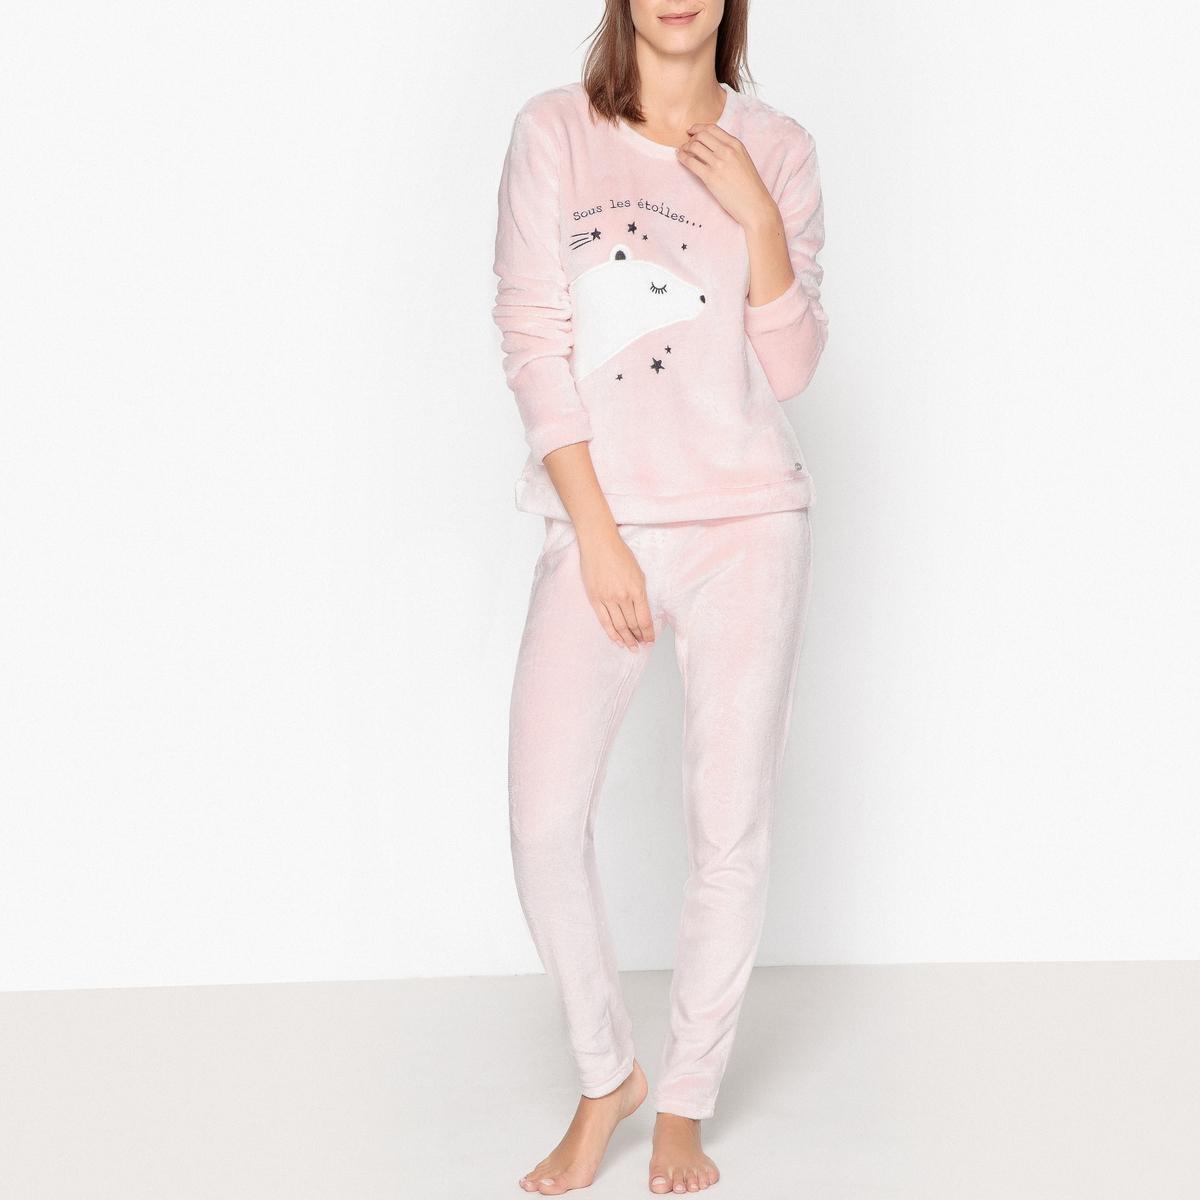 Пижама из велюра с рисунком медведи пижама с шортами с рисунком